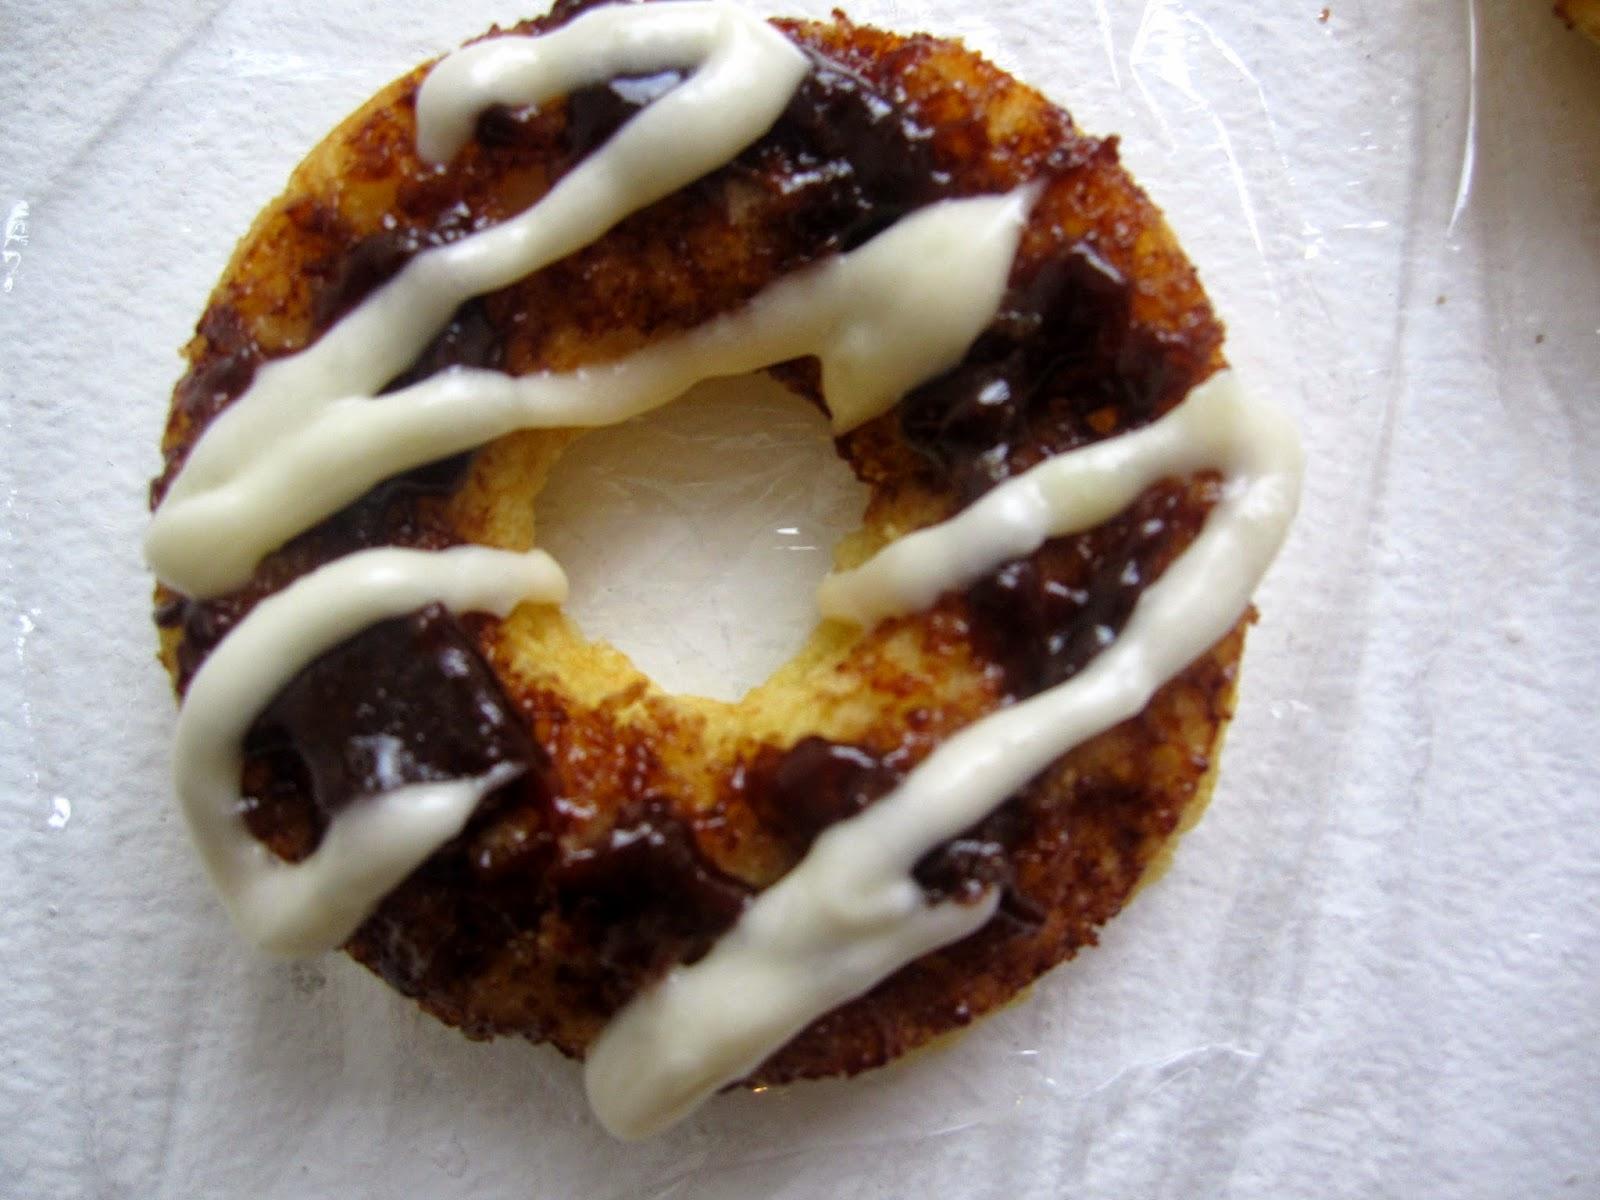 Cinnamon Roll Baked Doughnuts